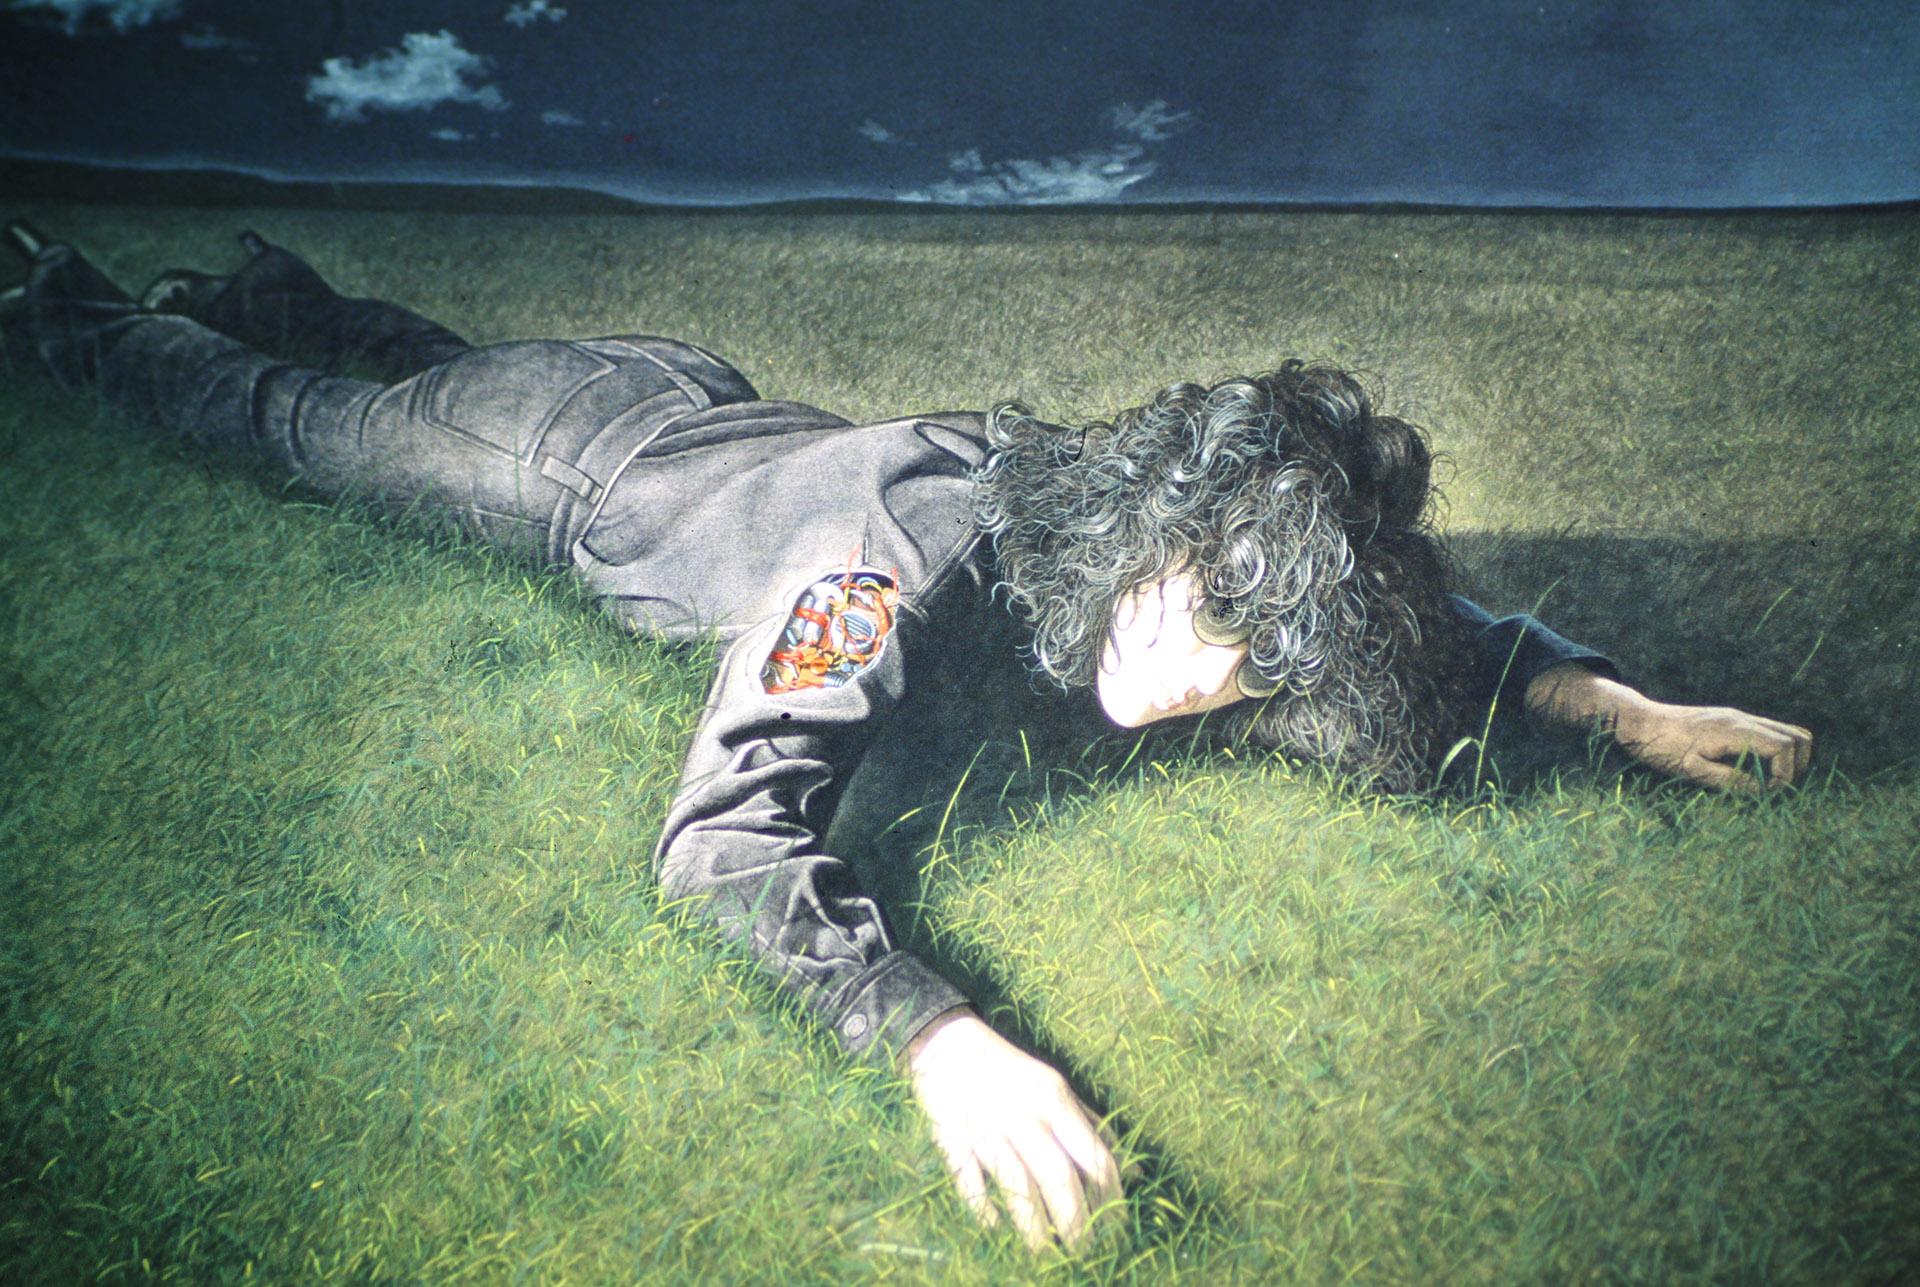 Untitled, record jacket, February 1981  Haruo Takino